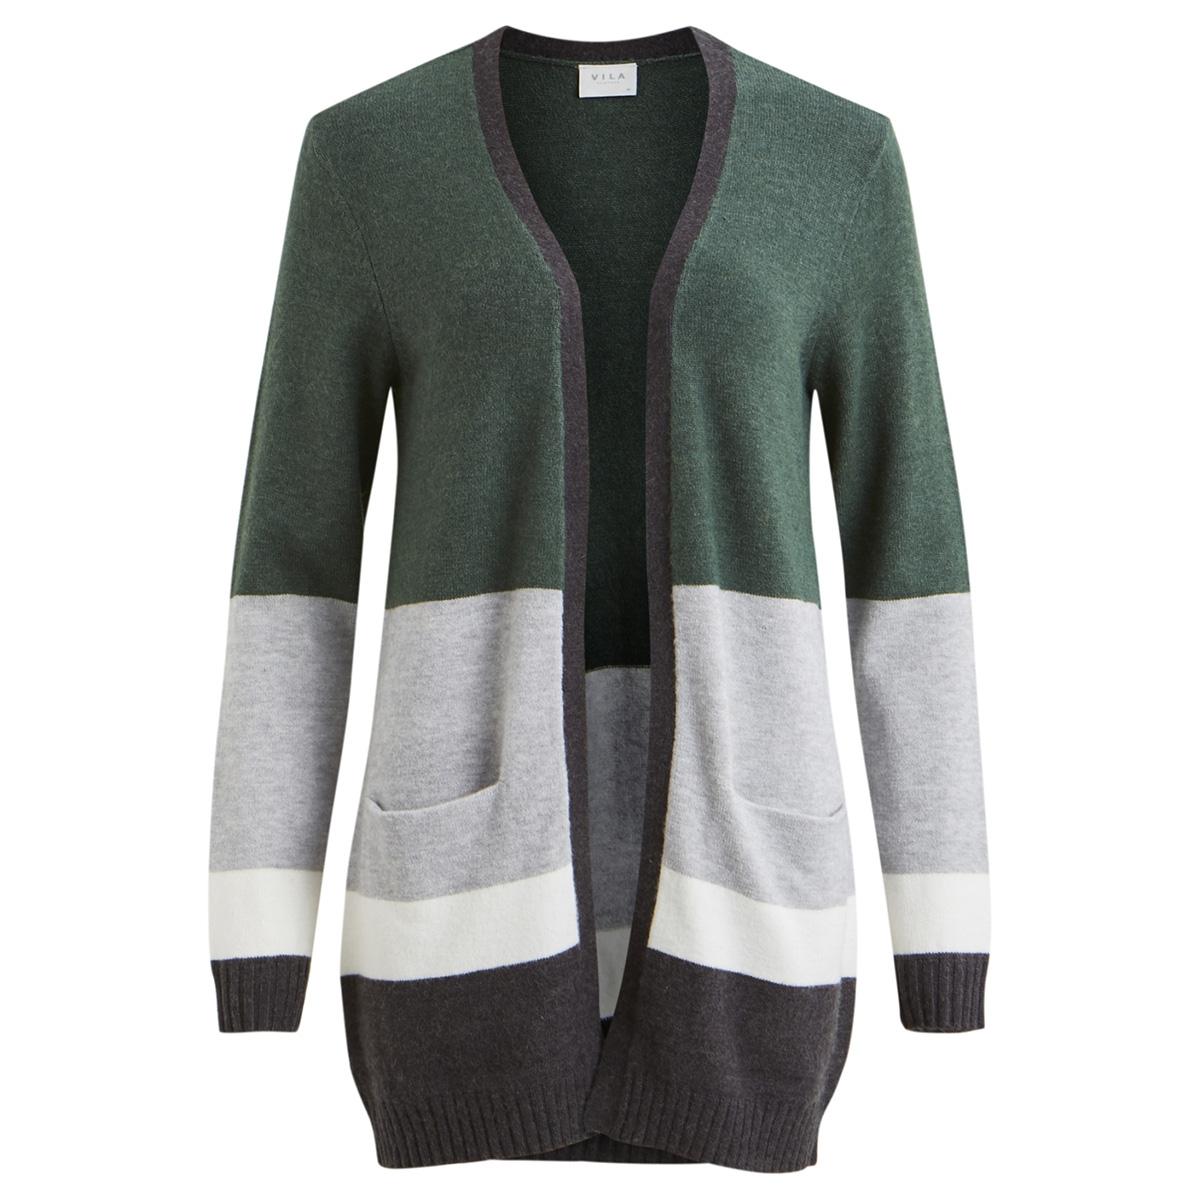 viril l/s stripe open knit cardigan 14052645 vila vest topiary/lgm/cloud